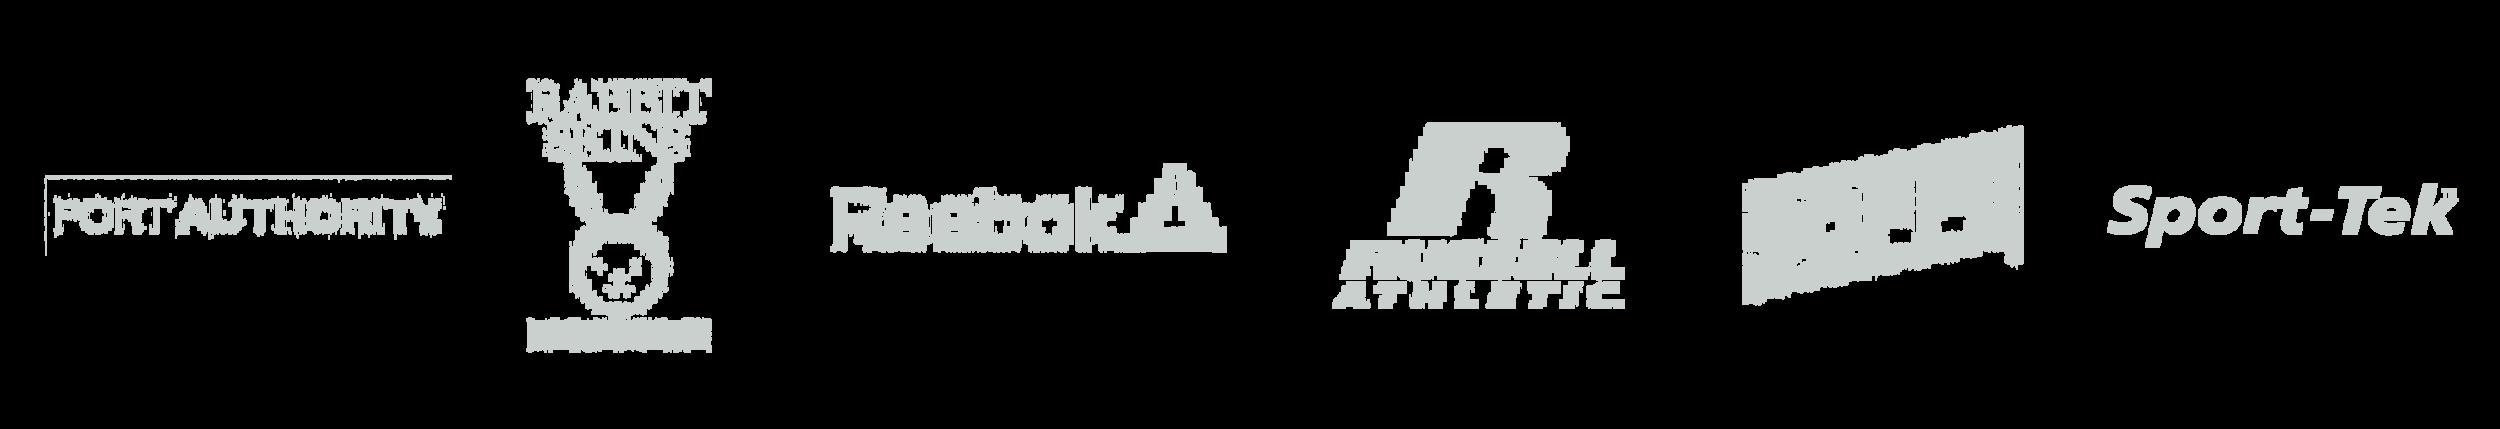 KYC_PortAuthority-RabbitSkins-Reebok-RussellAthletic-Soffe-SportTek.png